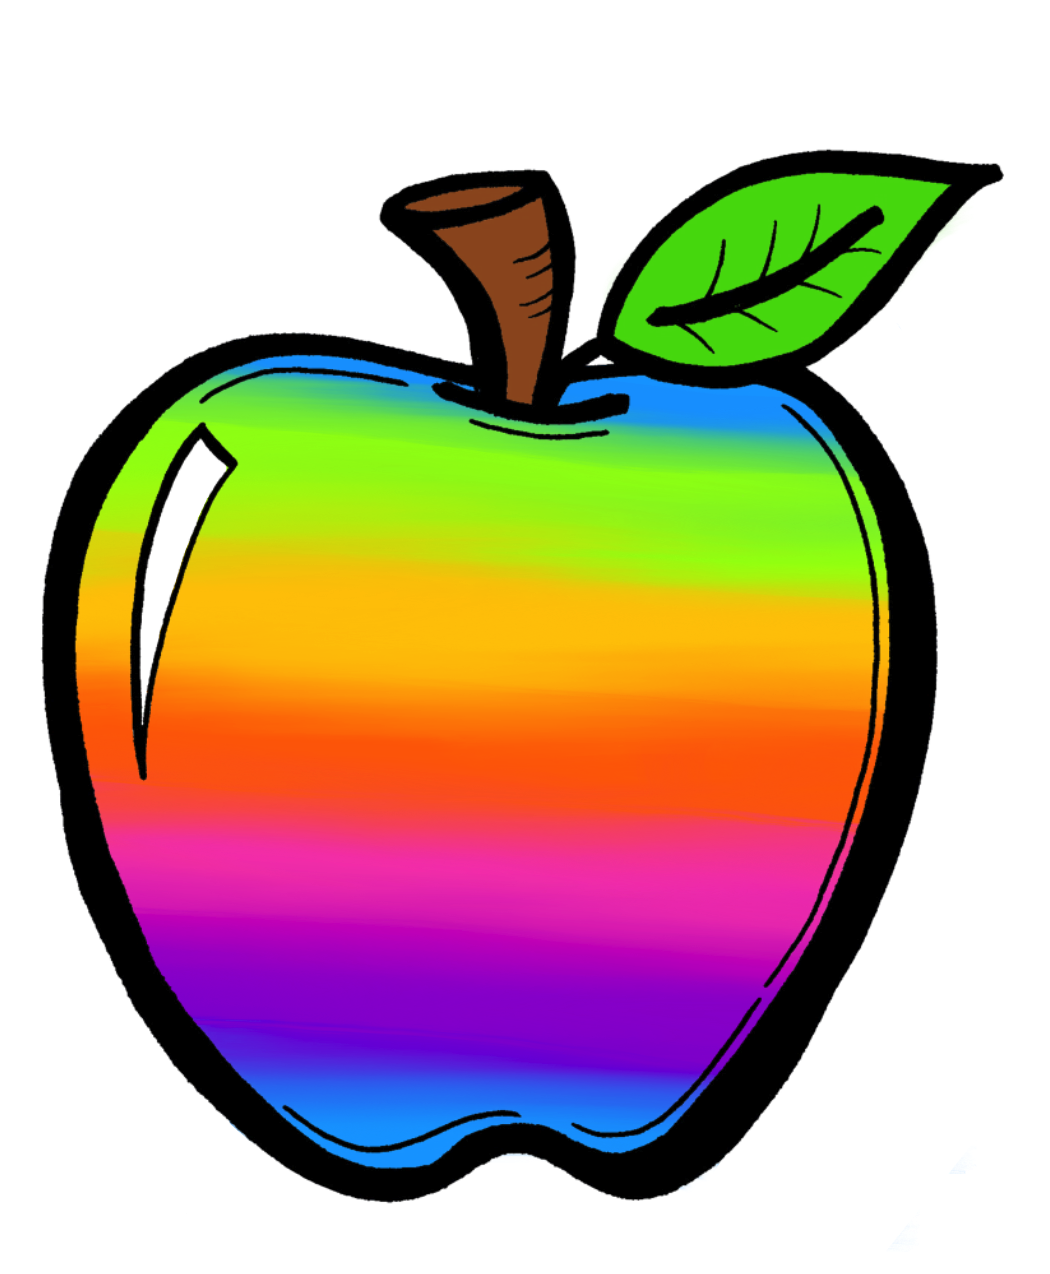 Apple flashcard